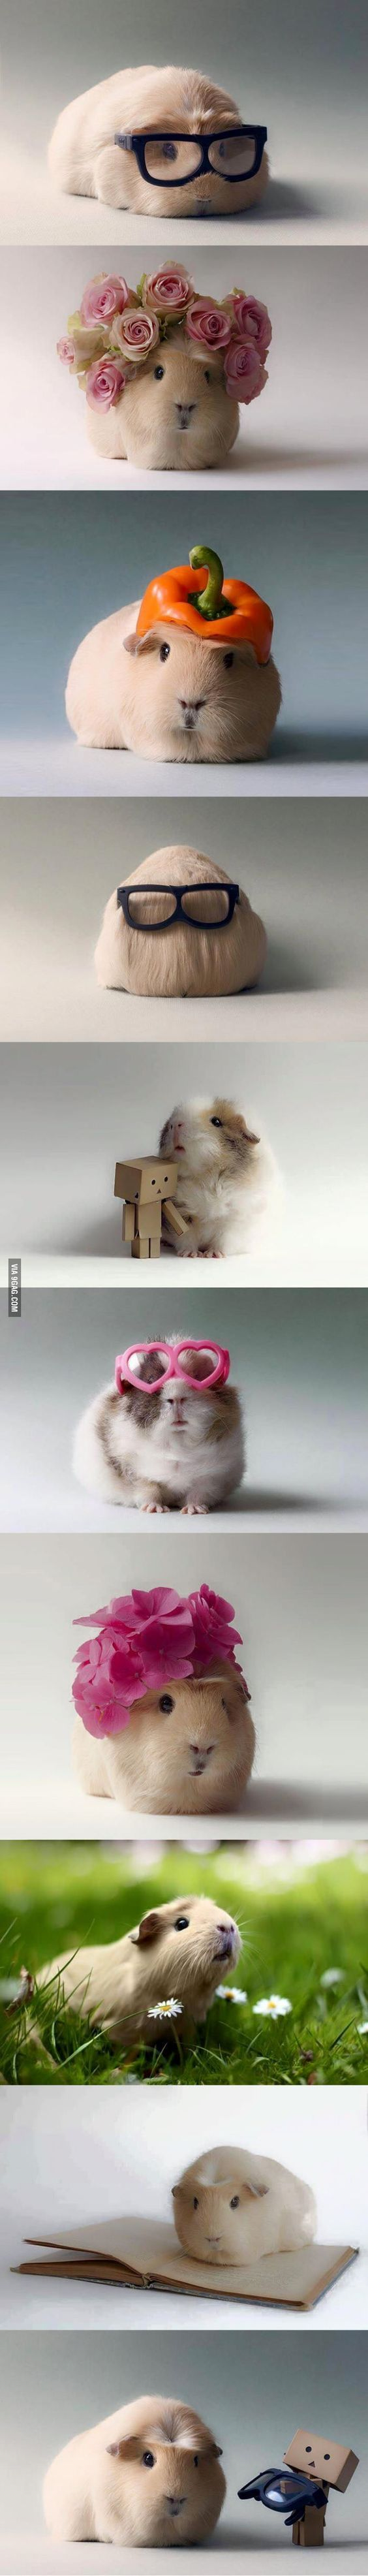 Cute guinea pig portraits!